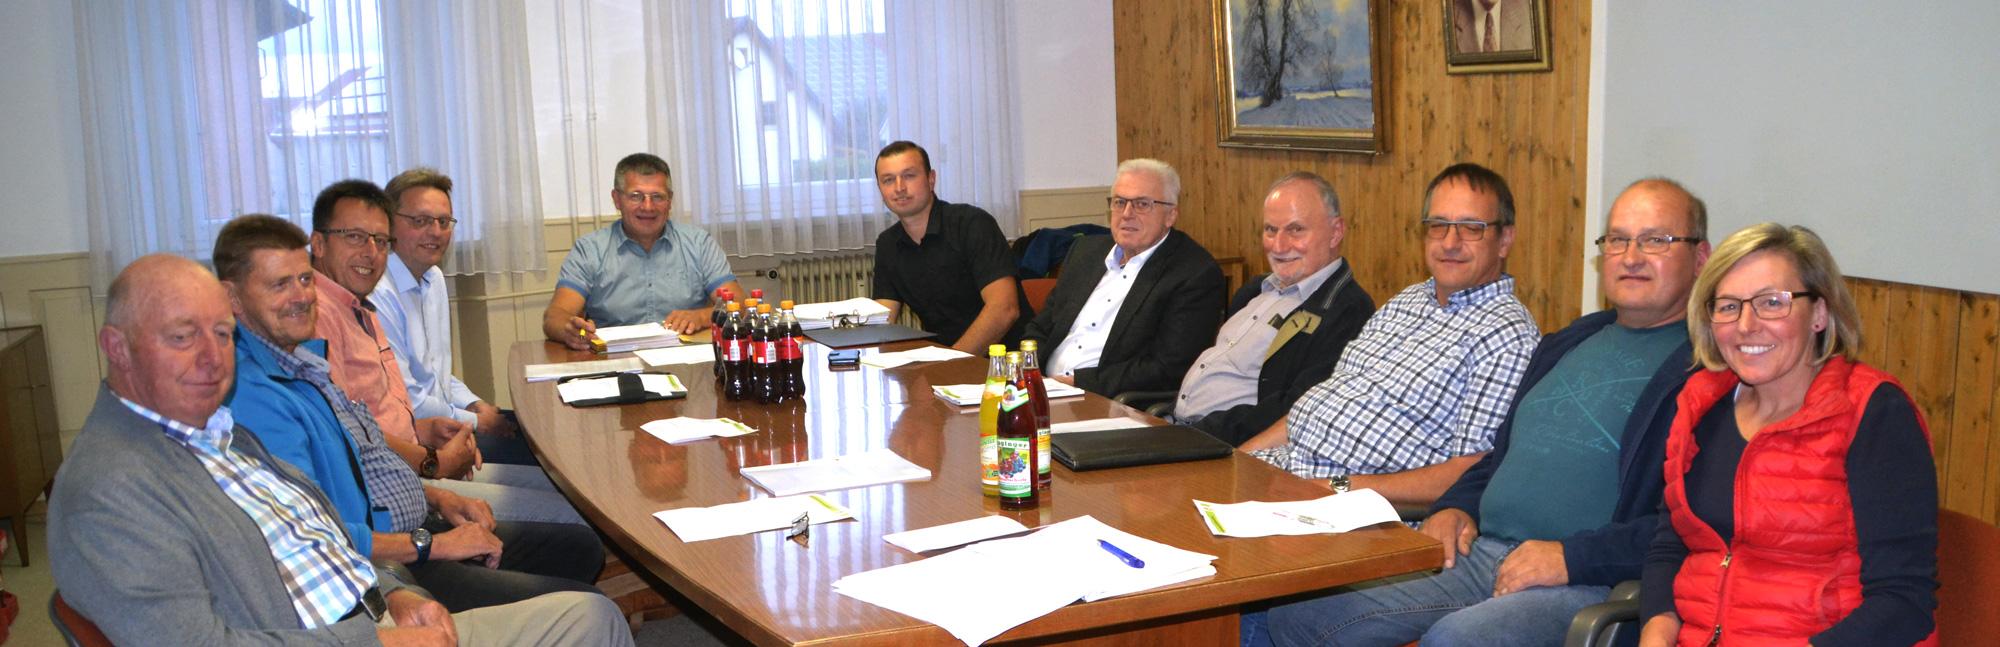 Energiegenossenschaft Gussenstadt eG – Aufsichtsrat